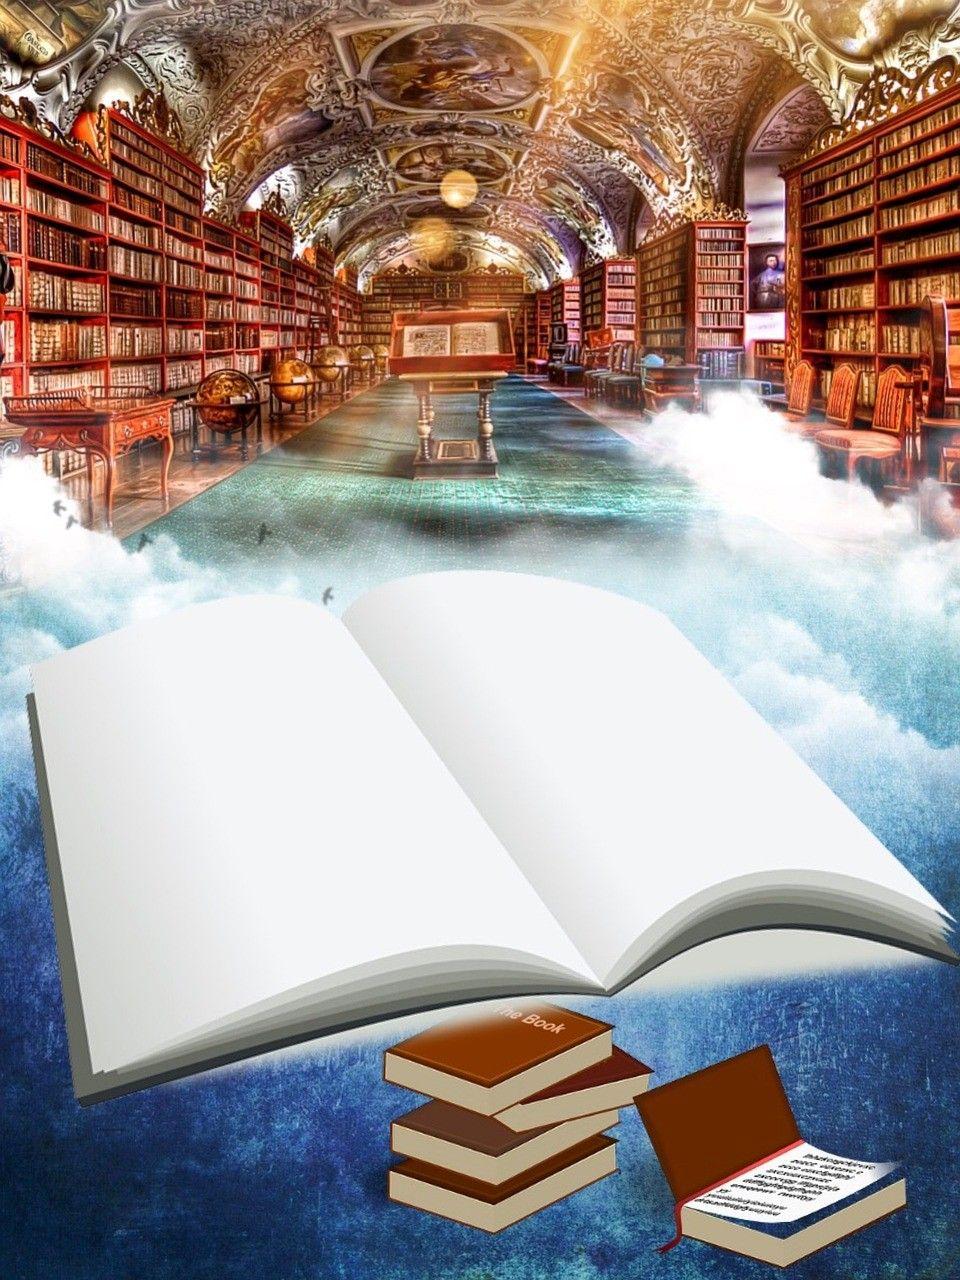 Картинки на тему книга библиотека, встречи жизнь прекрасна